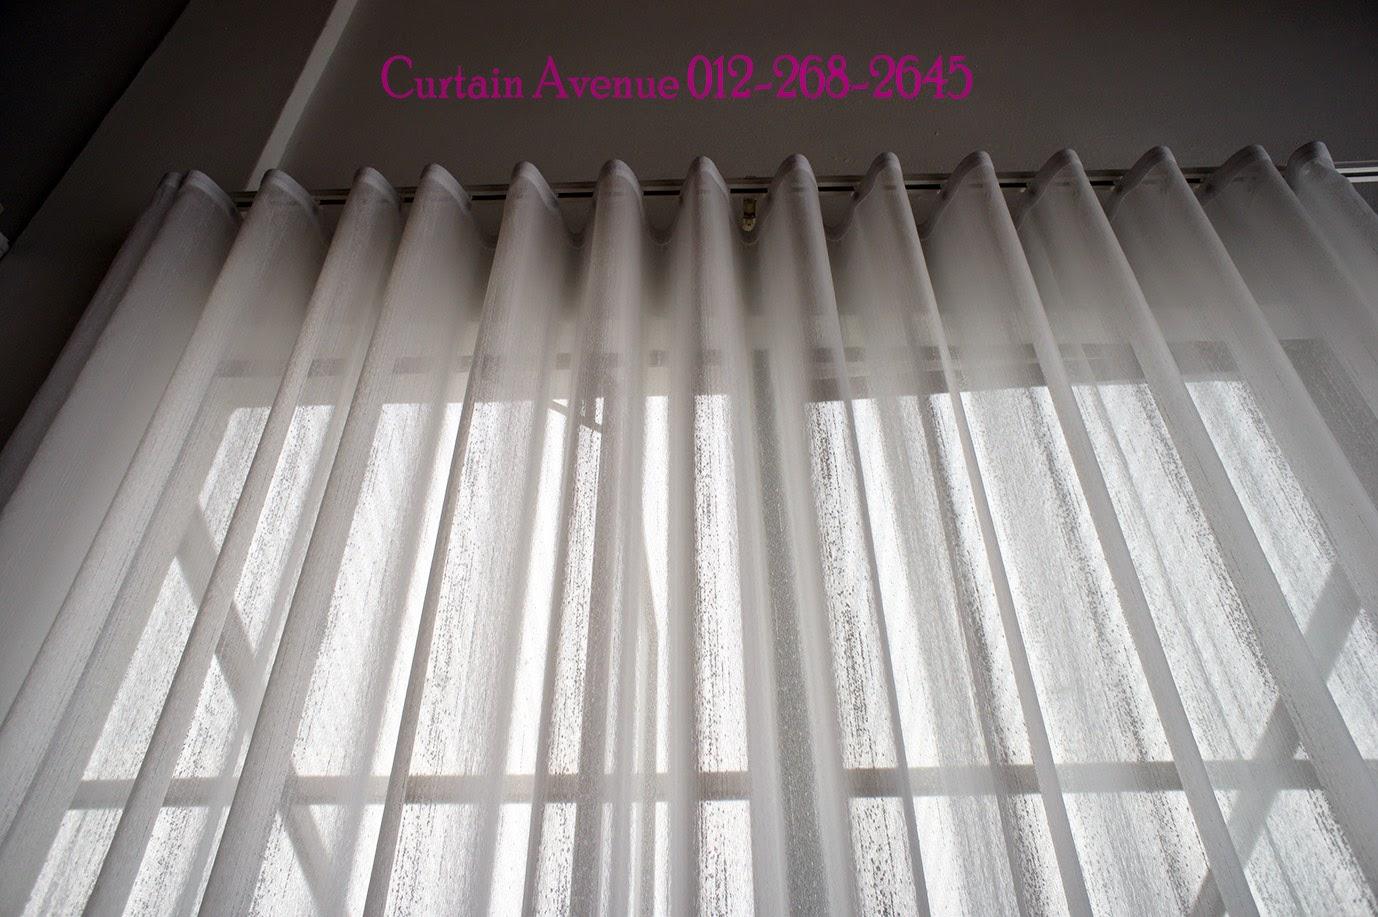 Curtain Avenue - Google+